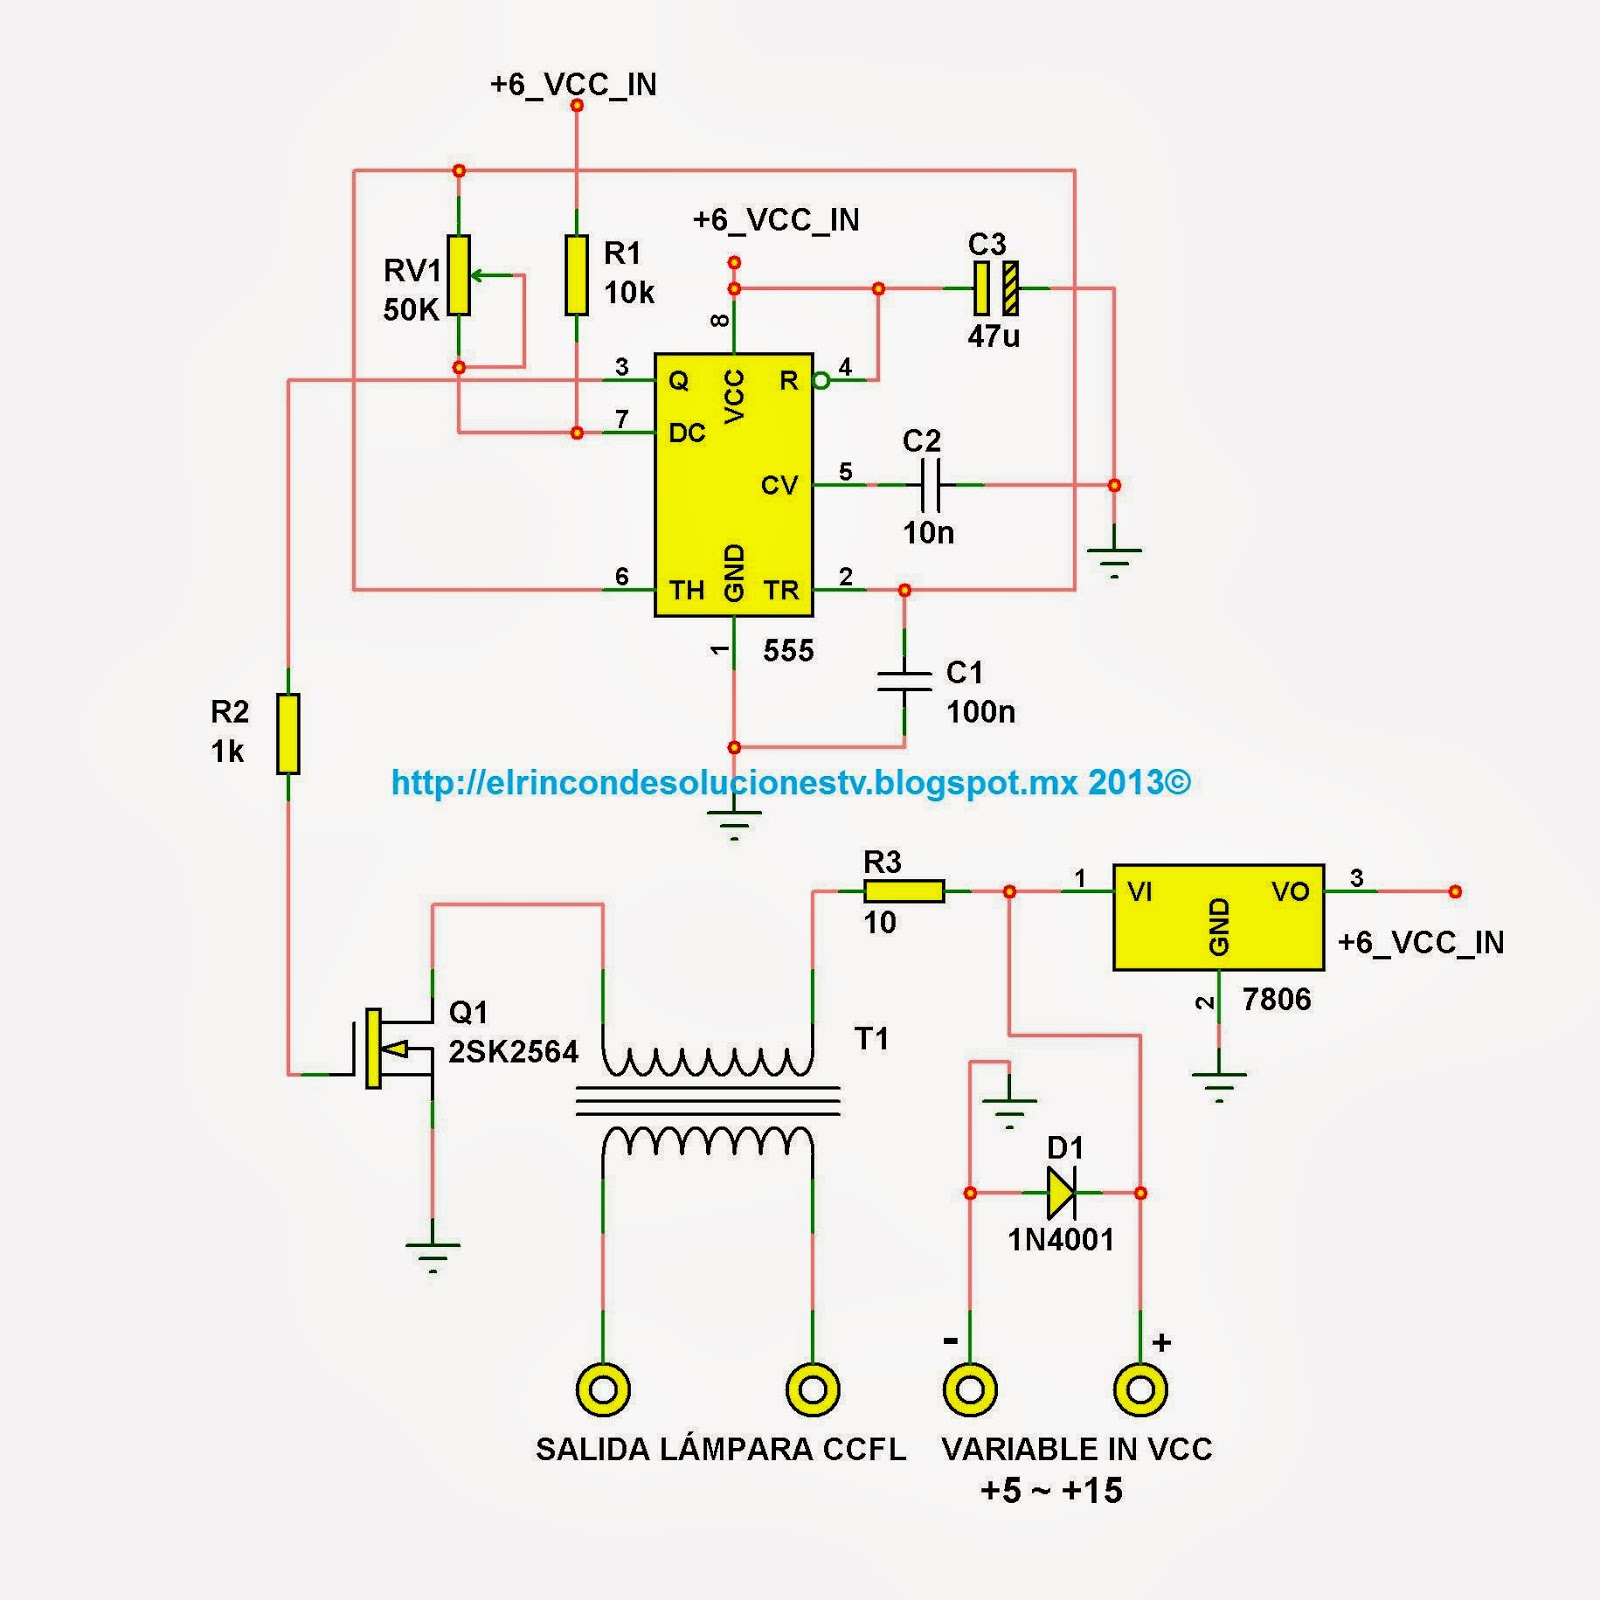 medium resolution of samsung refrigerator schematic diagram samsung get free power cord connector types extension cord wiring diagram